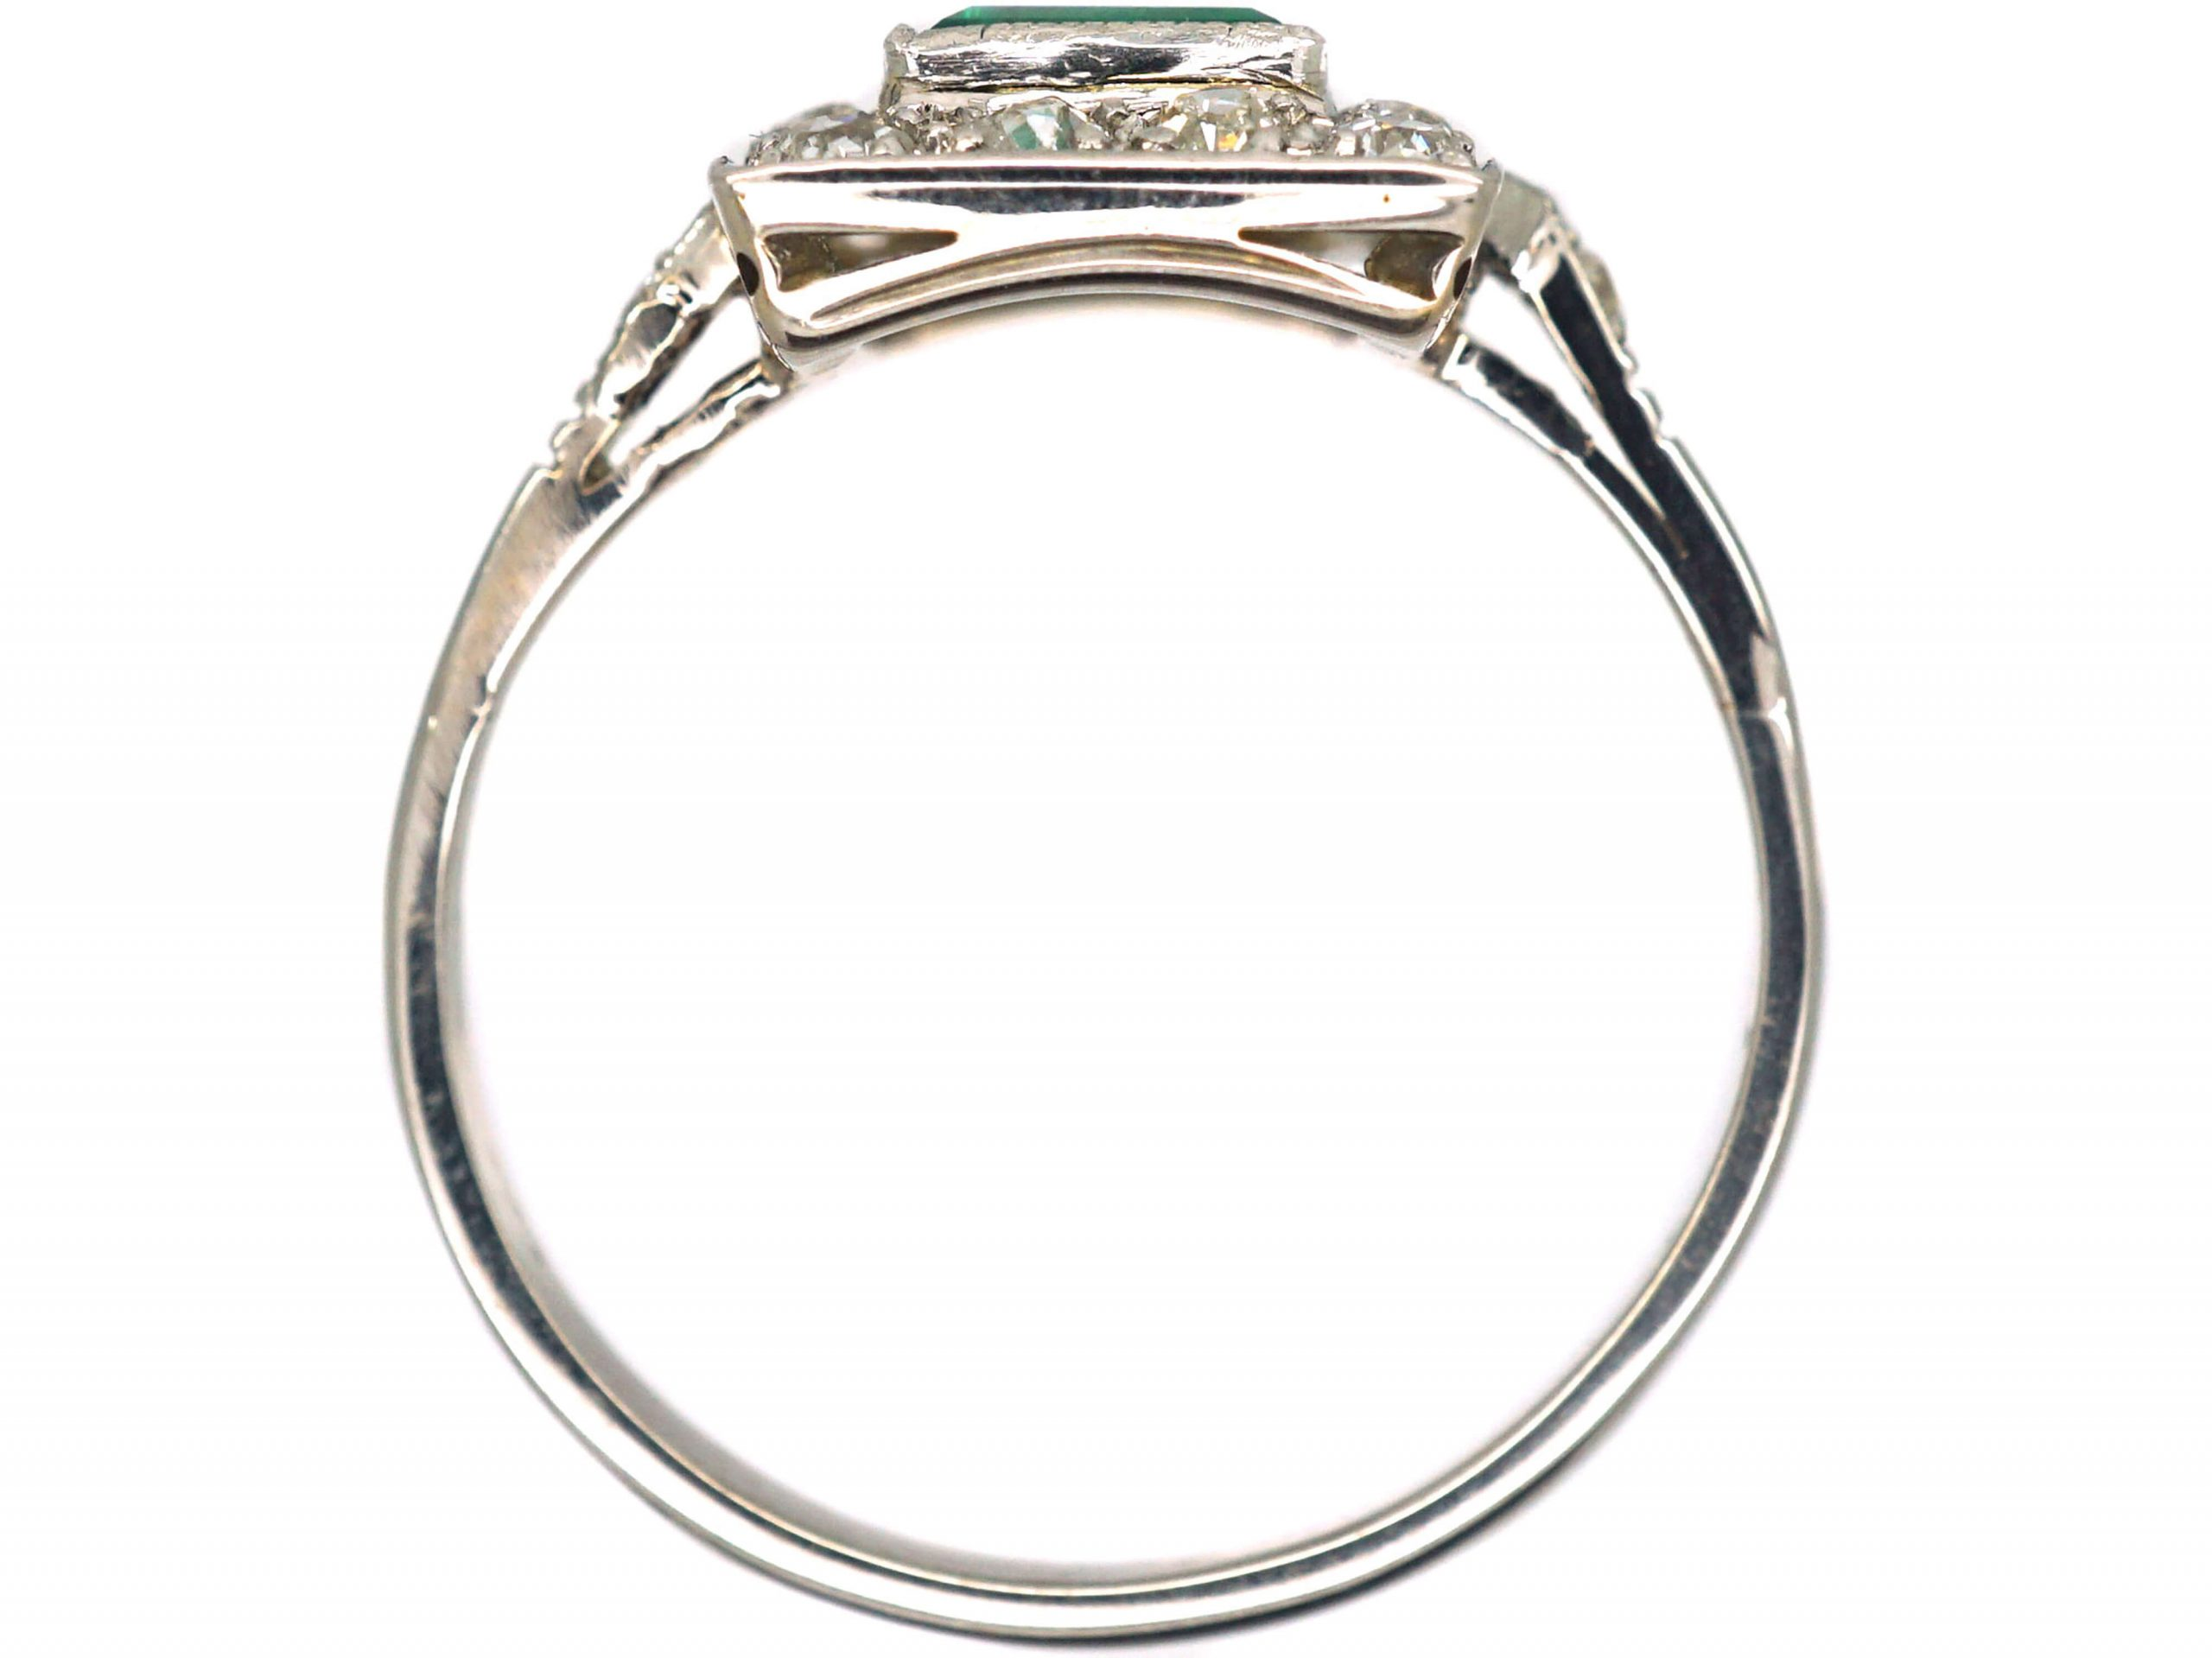 Art Deco Platinum & 18ct White Gold, Emerald & Diamond Rectangular Cluster Ring with Diamond set Shoulders